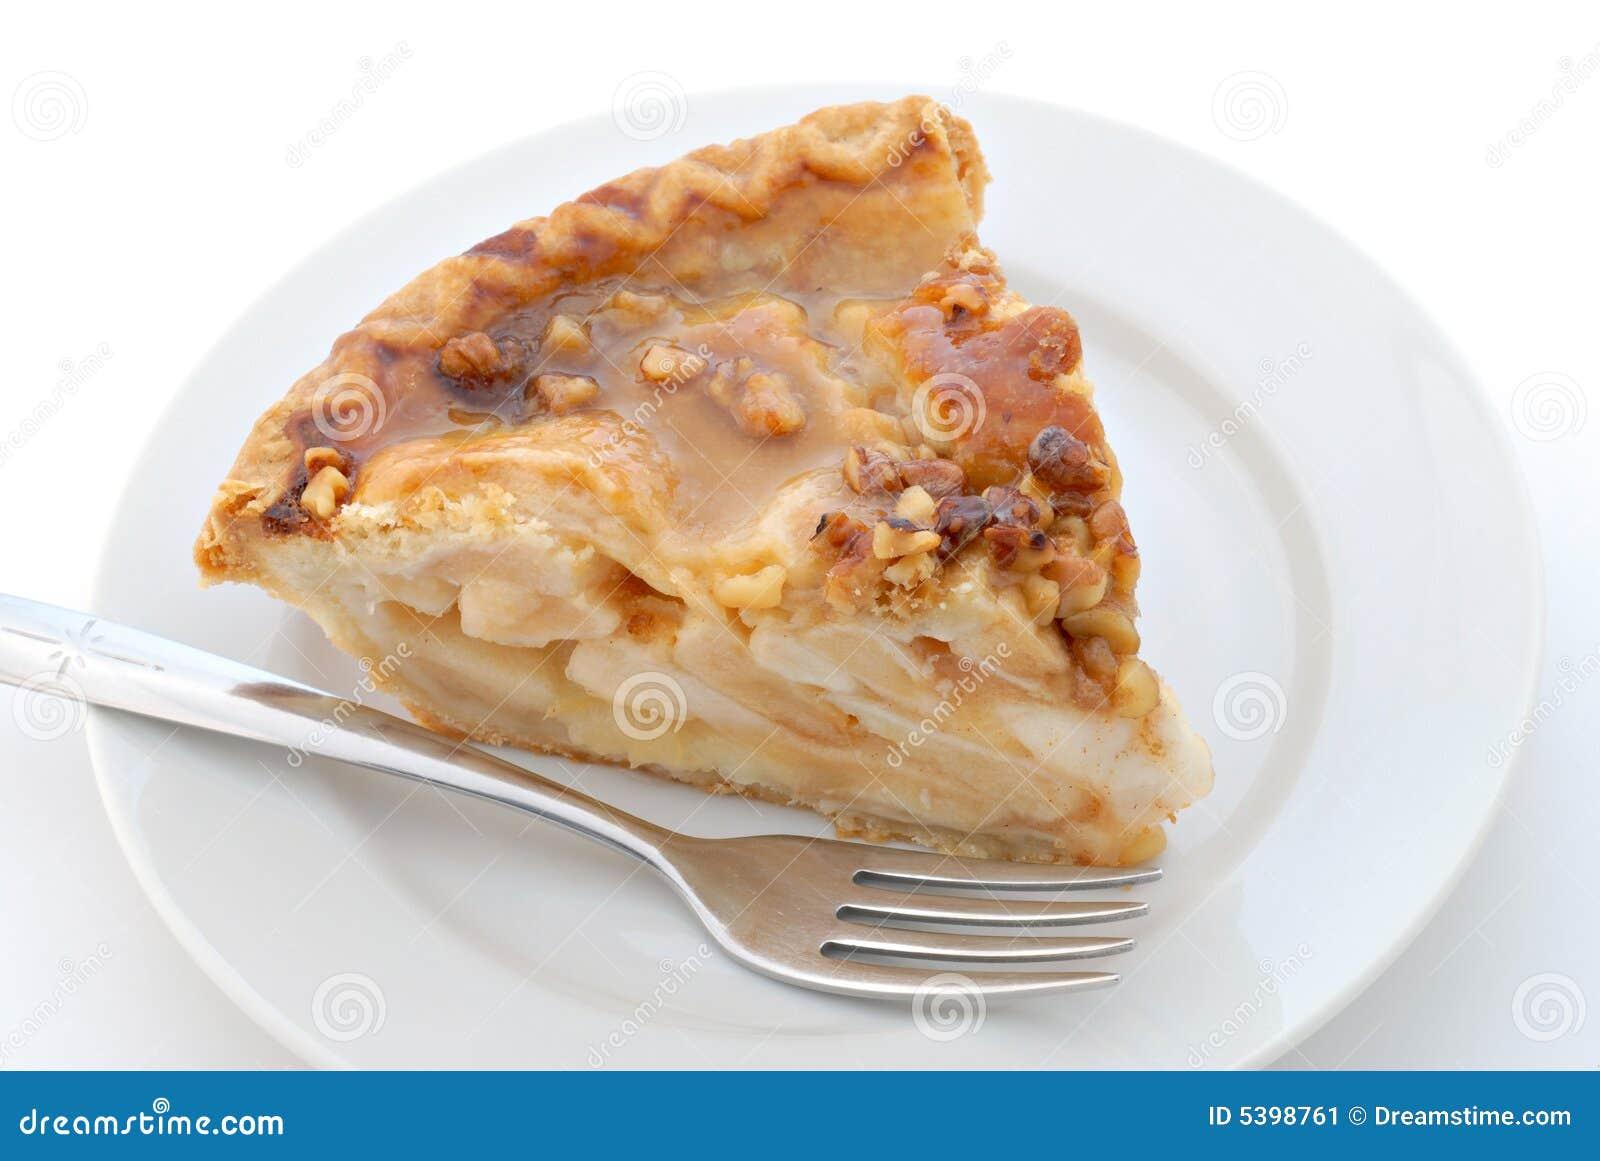 Karamell-Pekannuss-Apfelkuchen